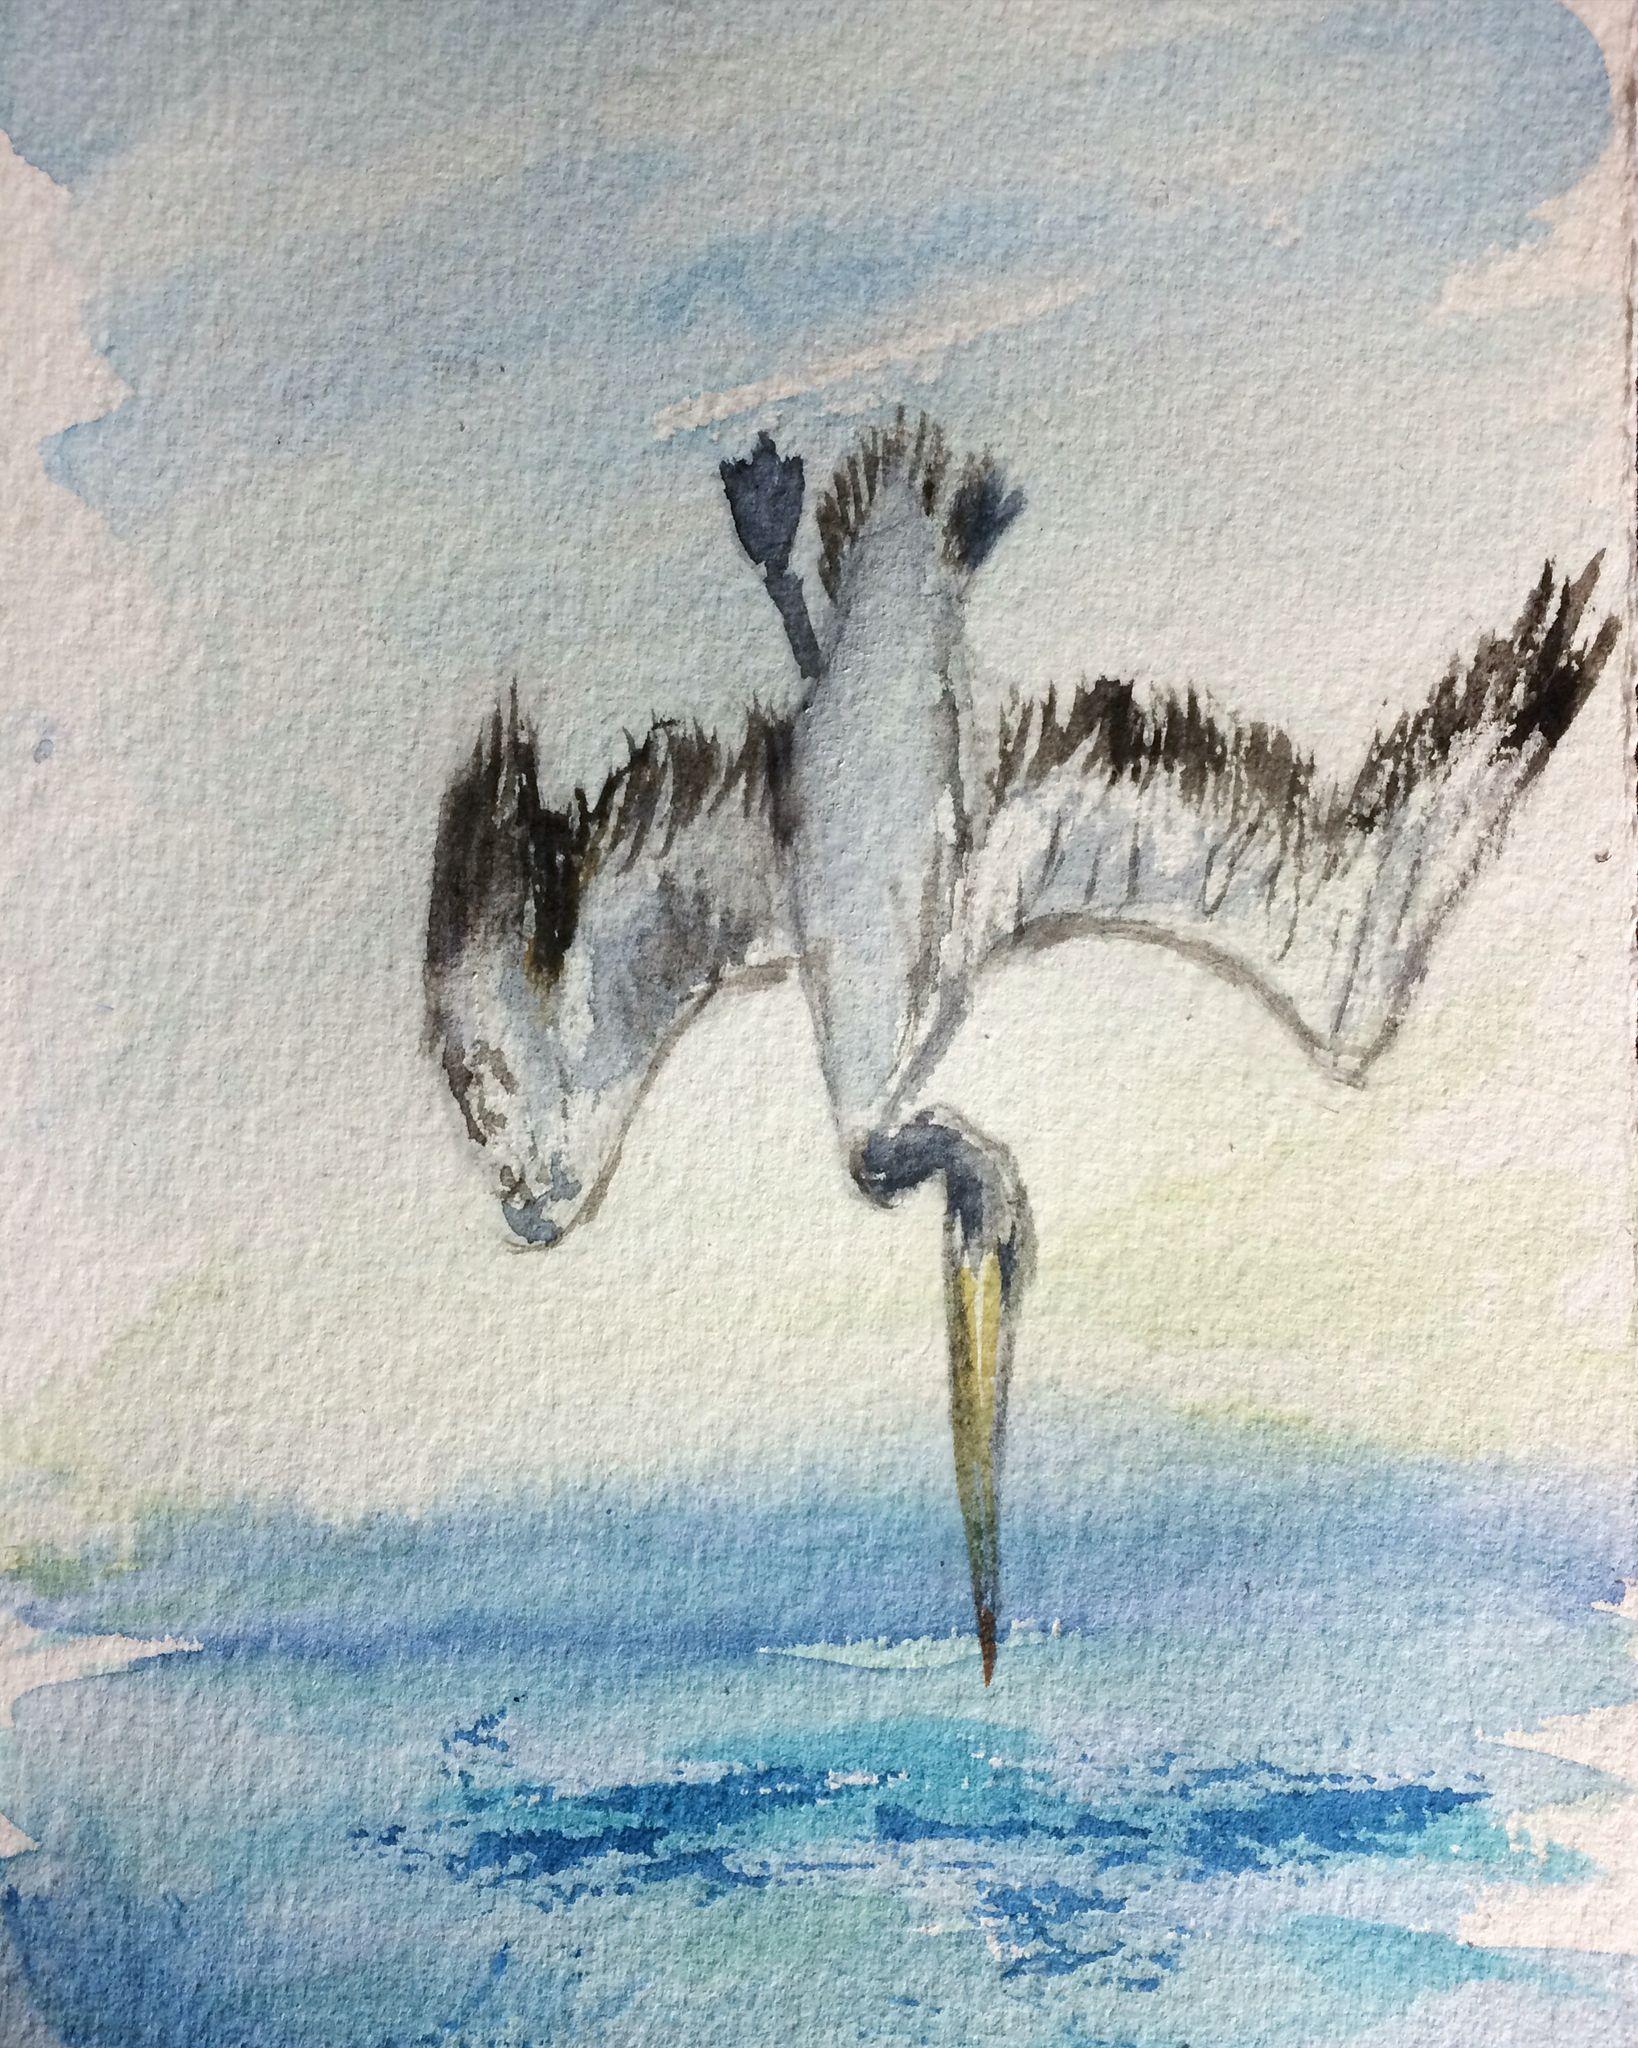 Diving pelican watercolor. See more stephartist.com